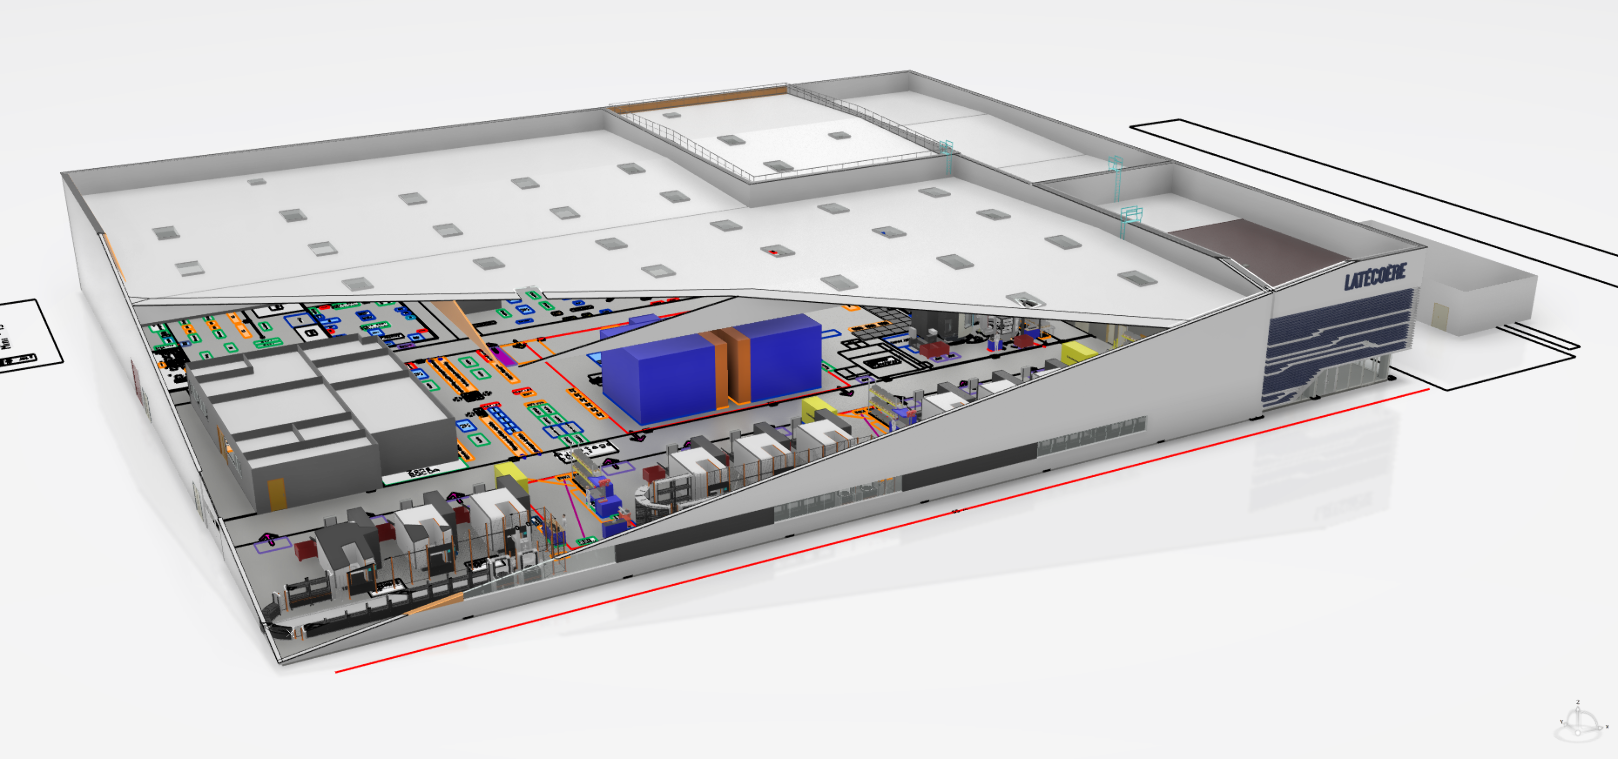 Latécoère breaks ground on smart factory